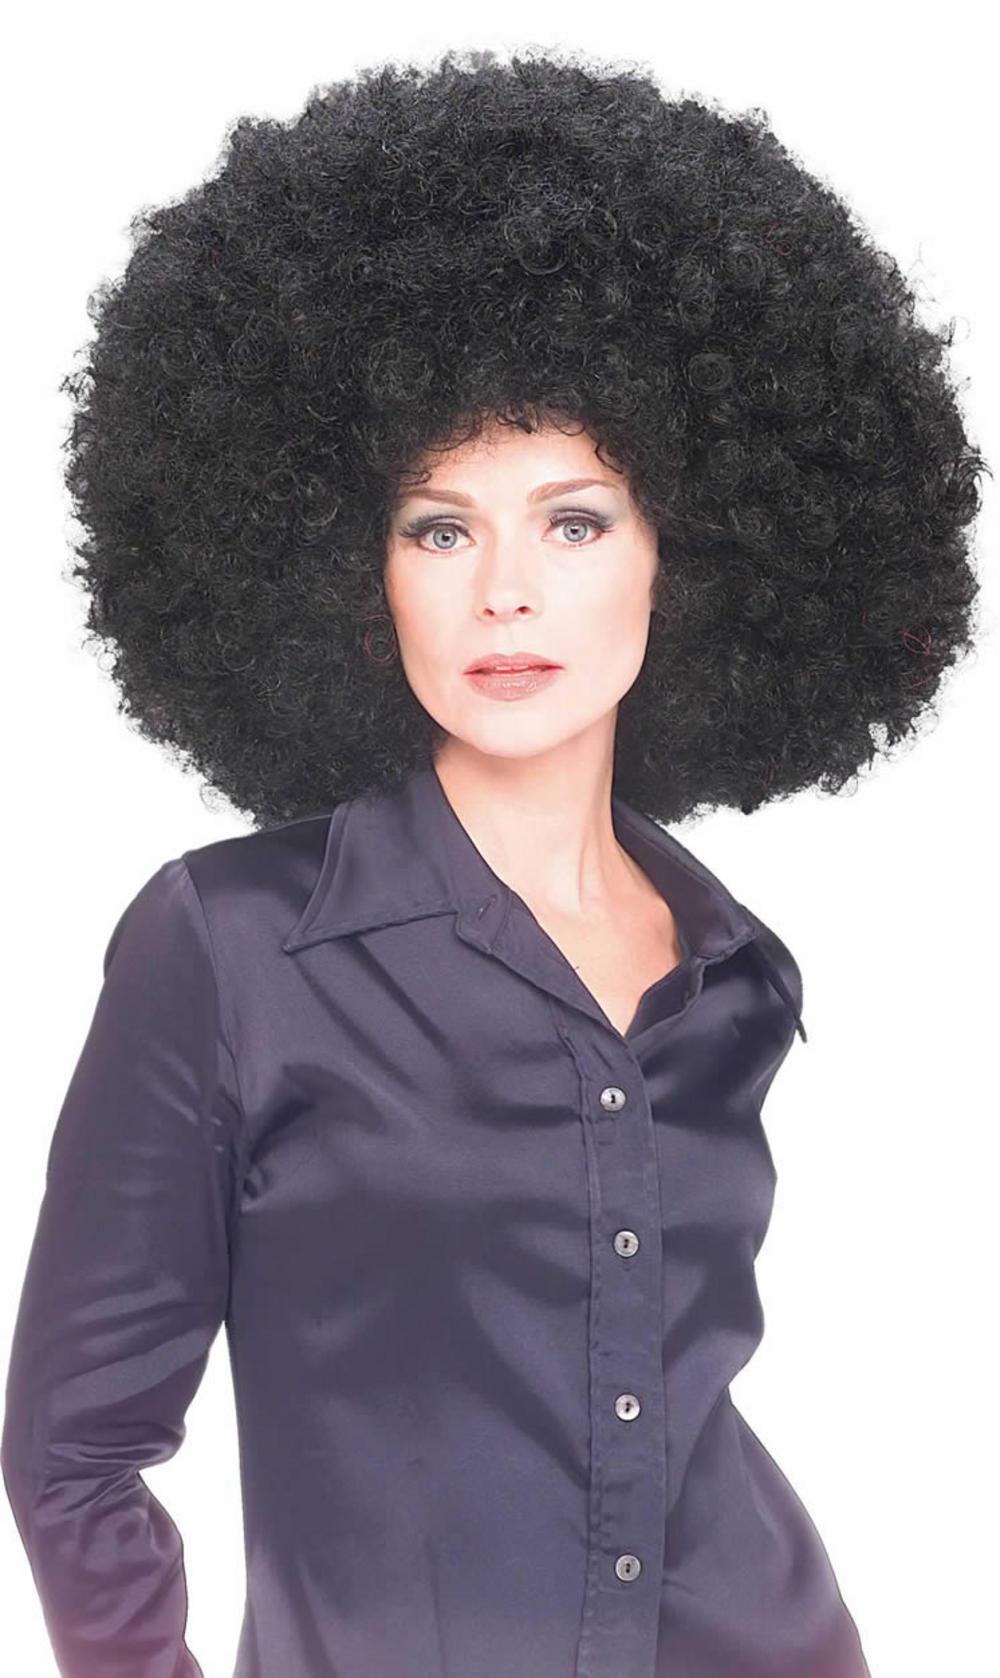 Jumbro Black Afro Wig  360470025